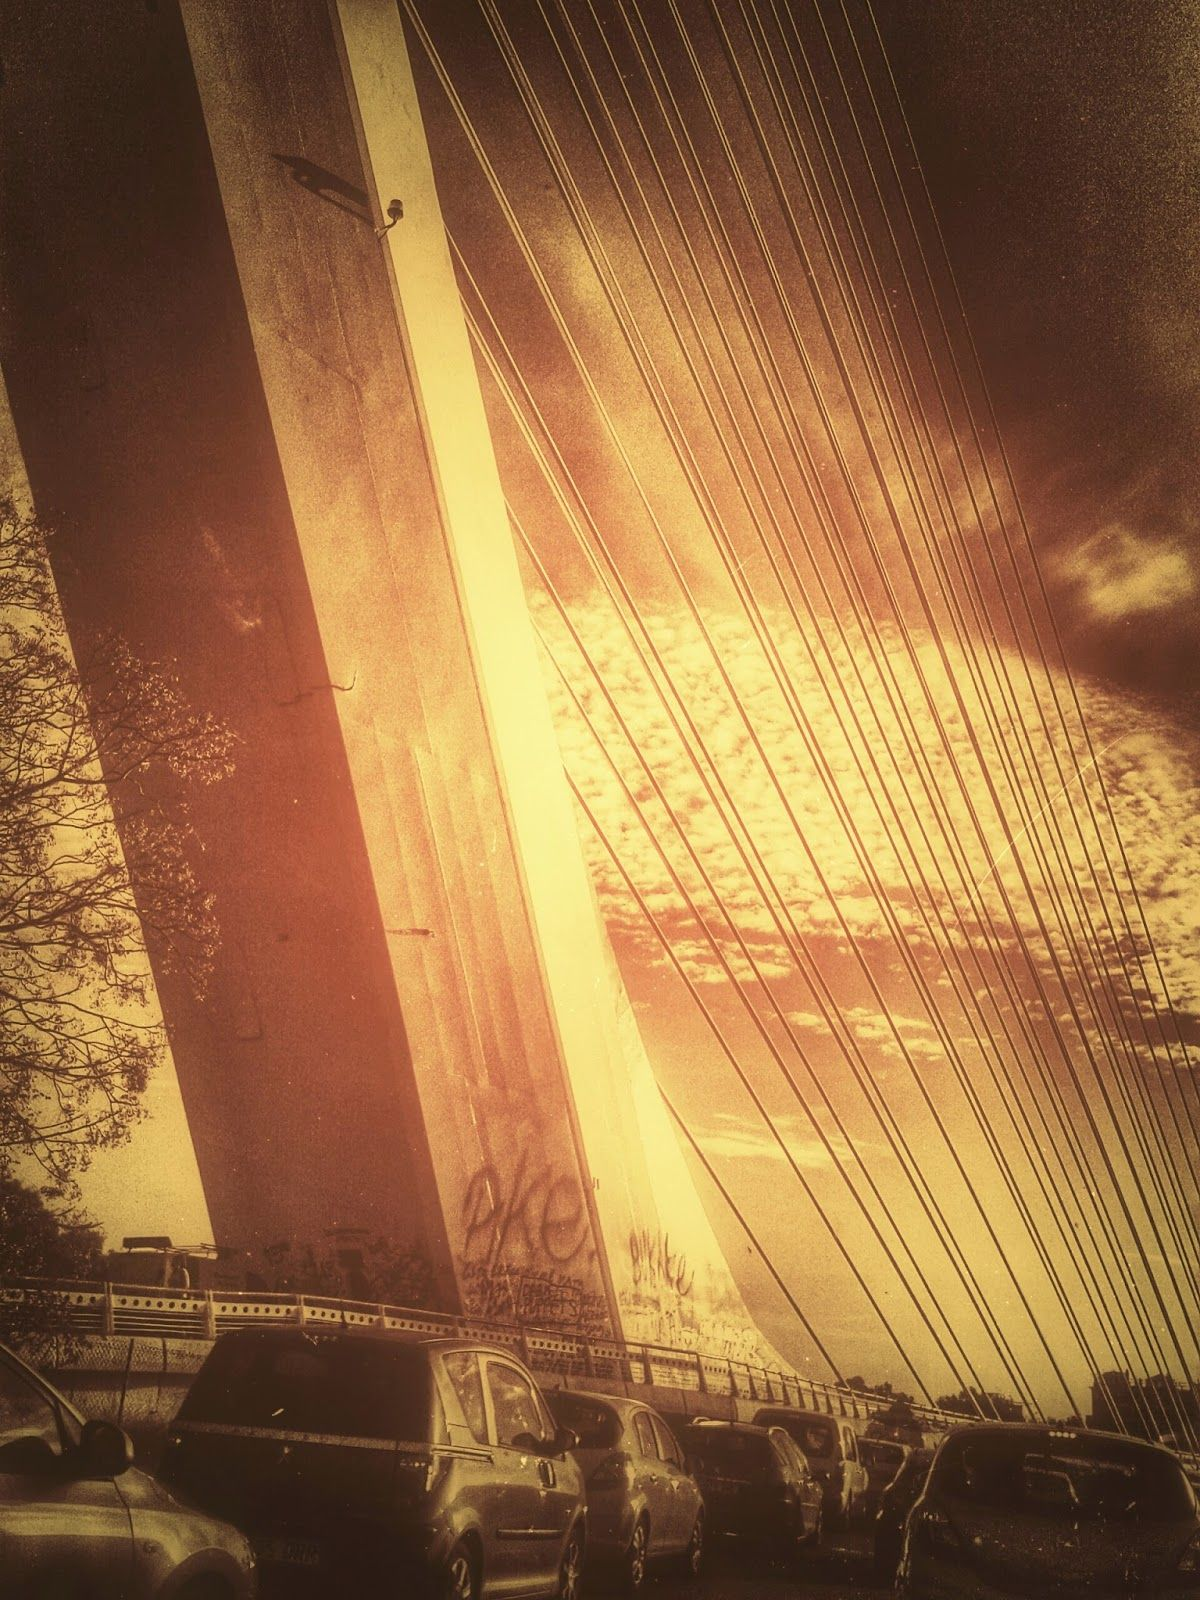 Meridiana claridad (Sofía Serra): Golden Gate de mi averno